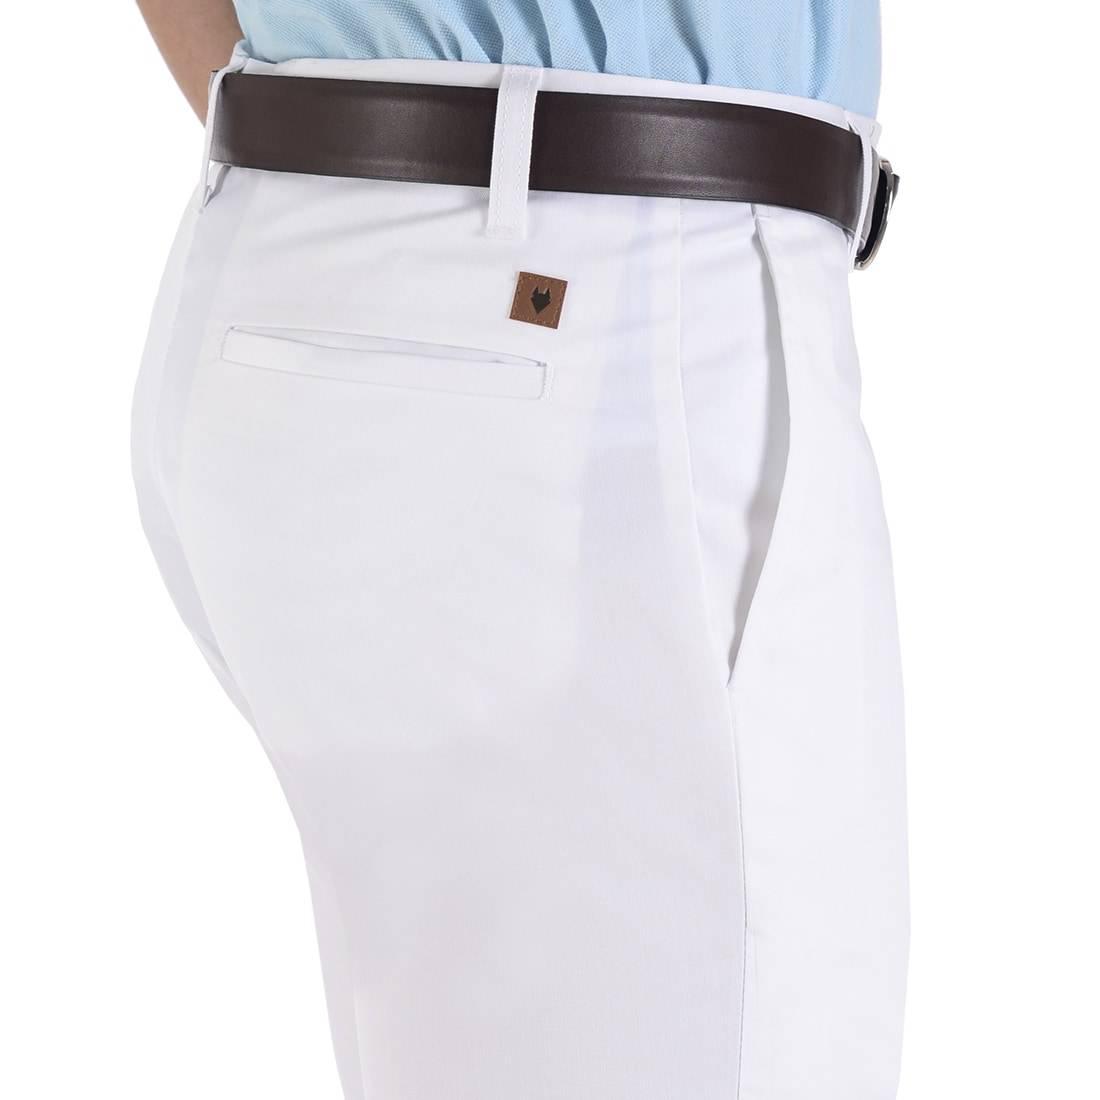 010920418902-04-Pantalon-Casual-Slim-Fit-Blanco-yale